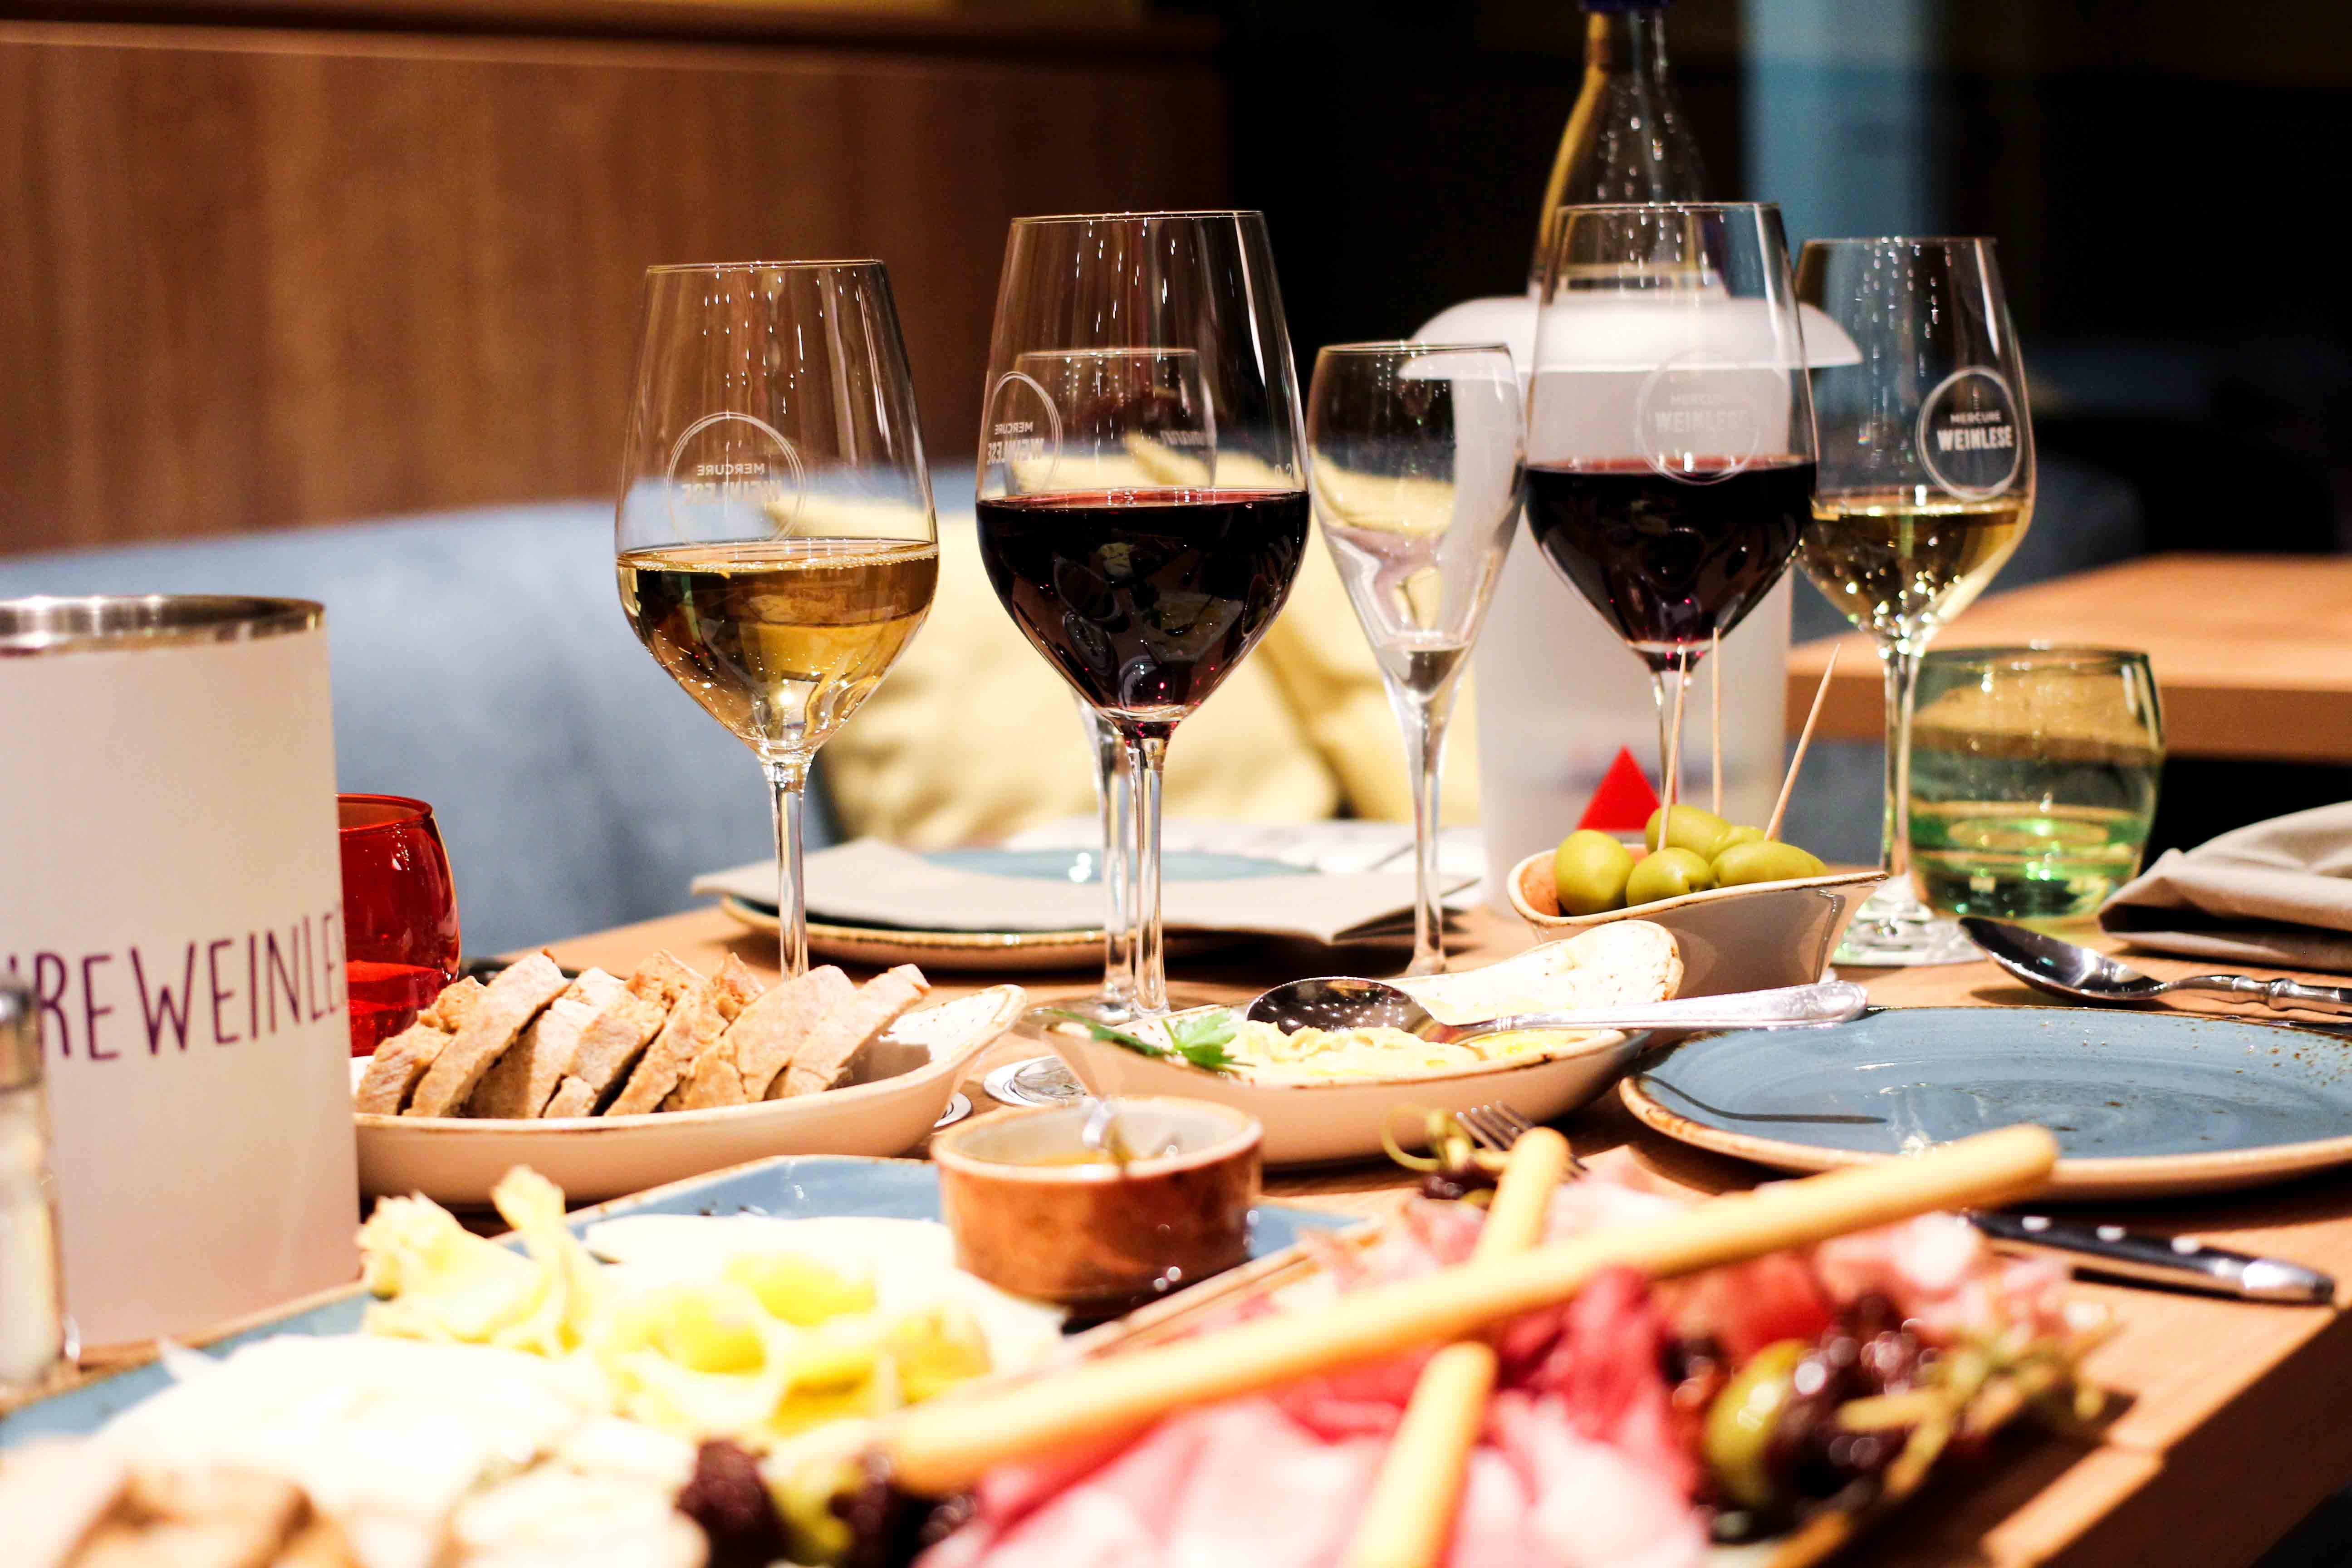 Mercure Weinlese Reiseblog Weinprobe Mercure Mannheim Antipasti Rotwein